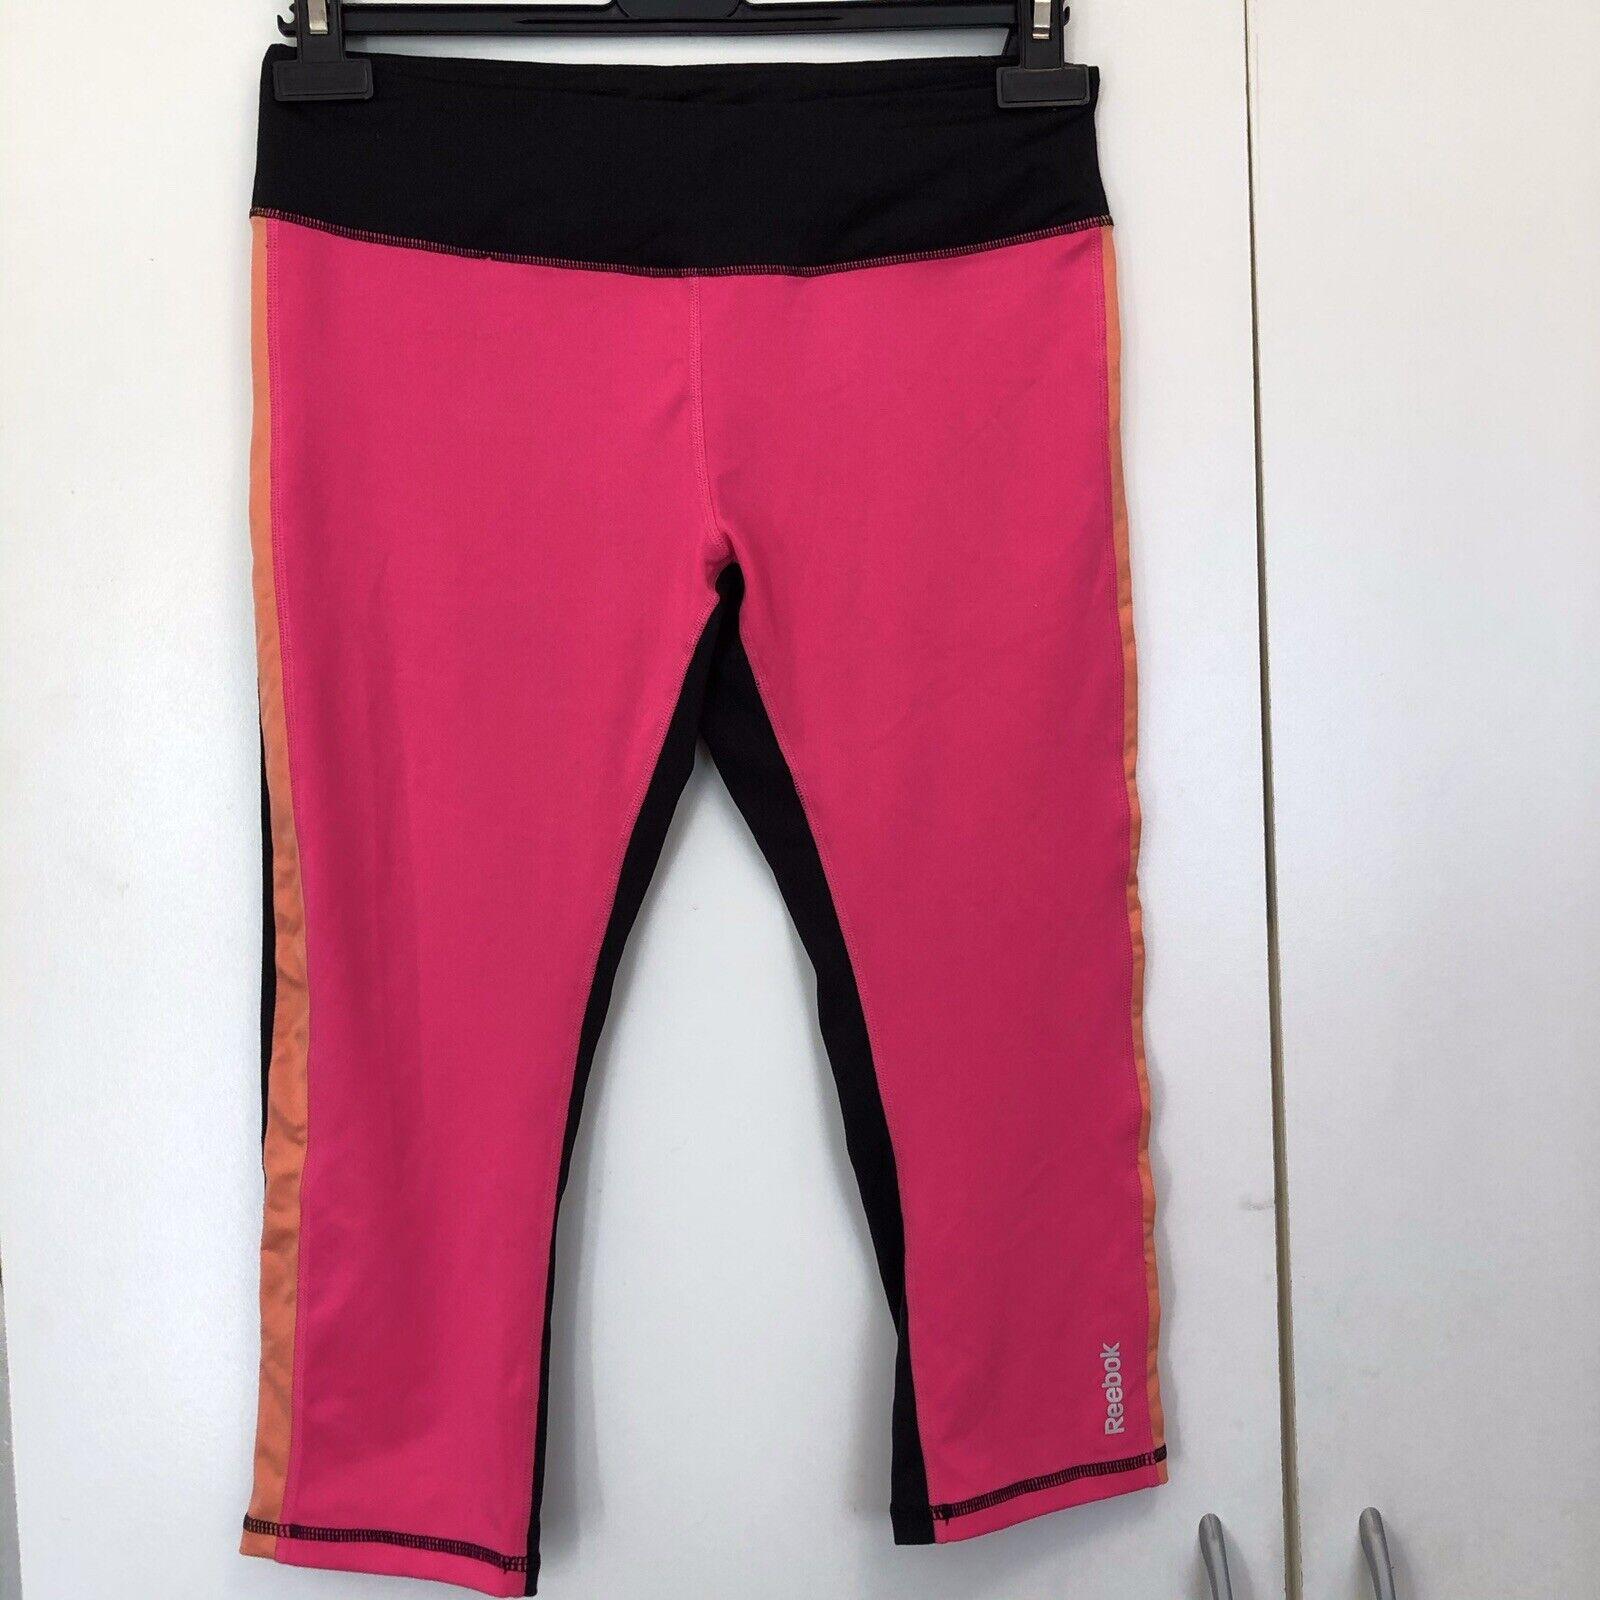 Reebok Capri Crop Workout Leggings Size M Pink Black